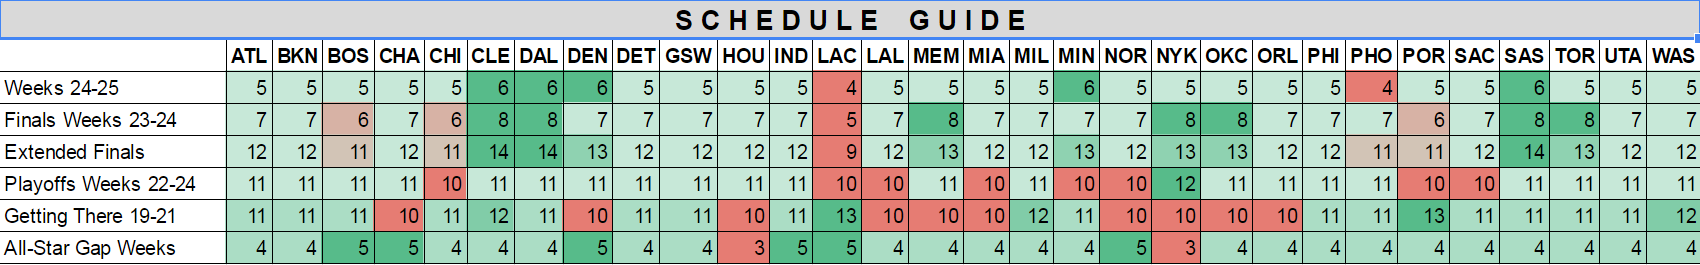 2016-09-21-11_31_53-schedule-cheat-sheet-google-sheets